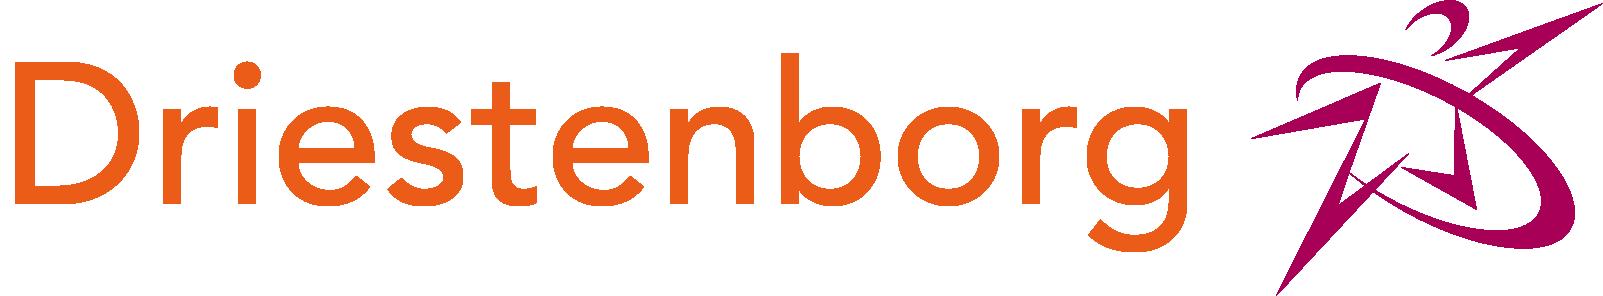 driestenborg logo